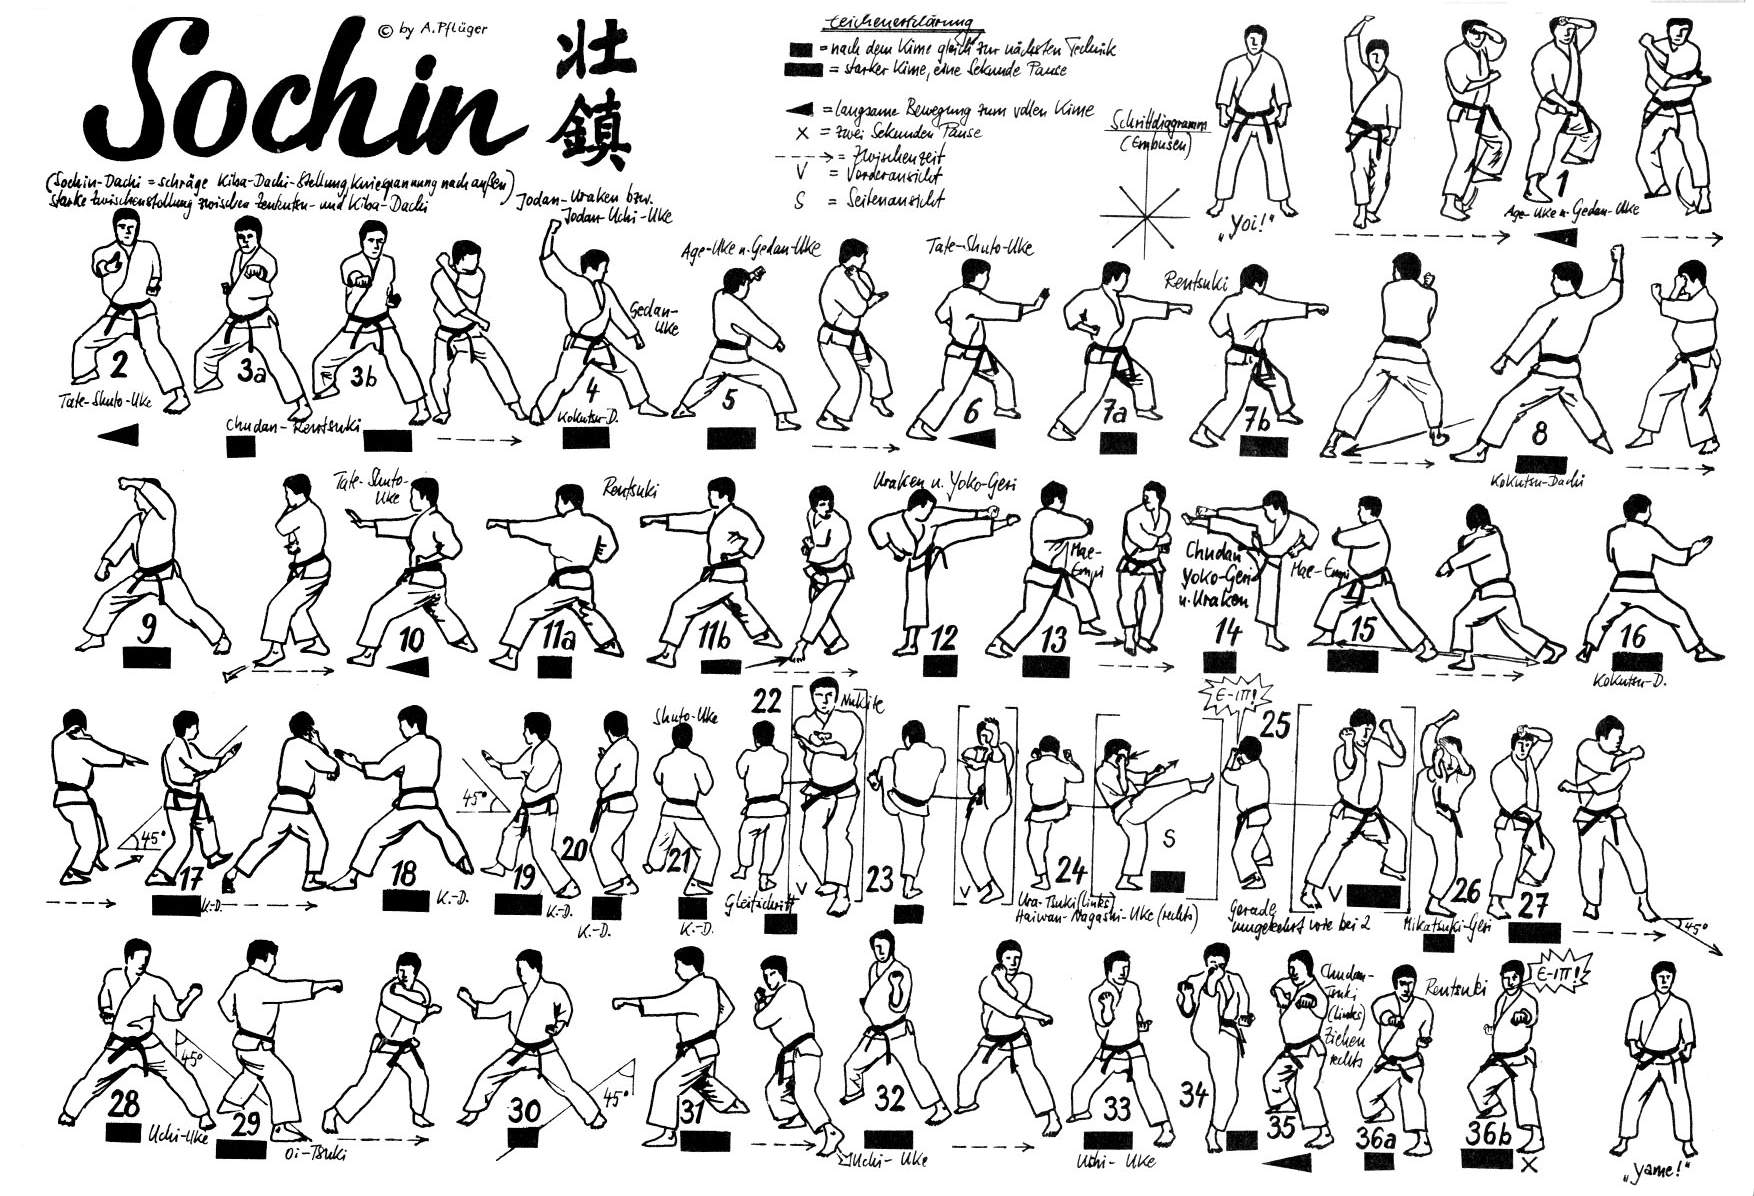 Sochin Diagram